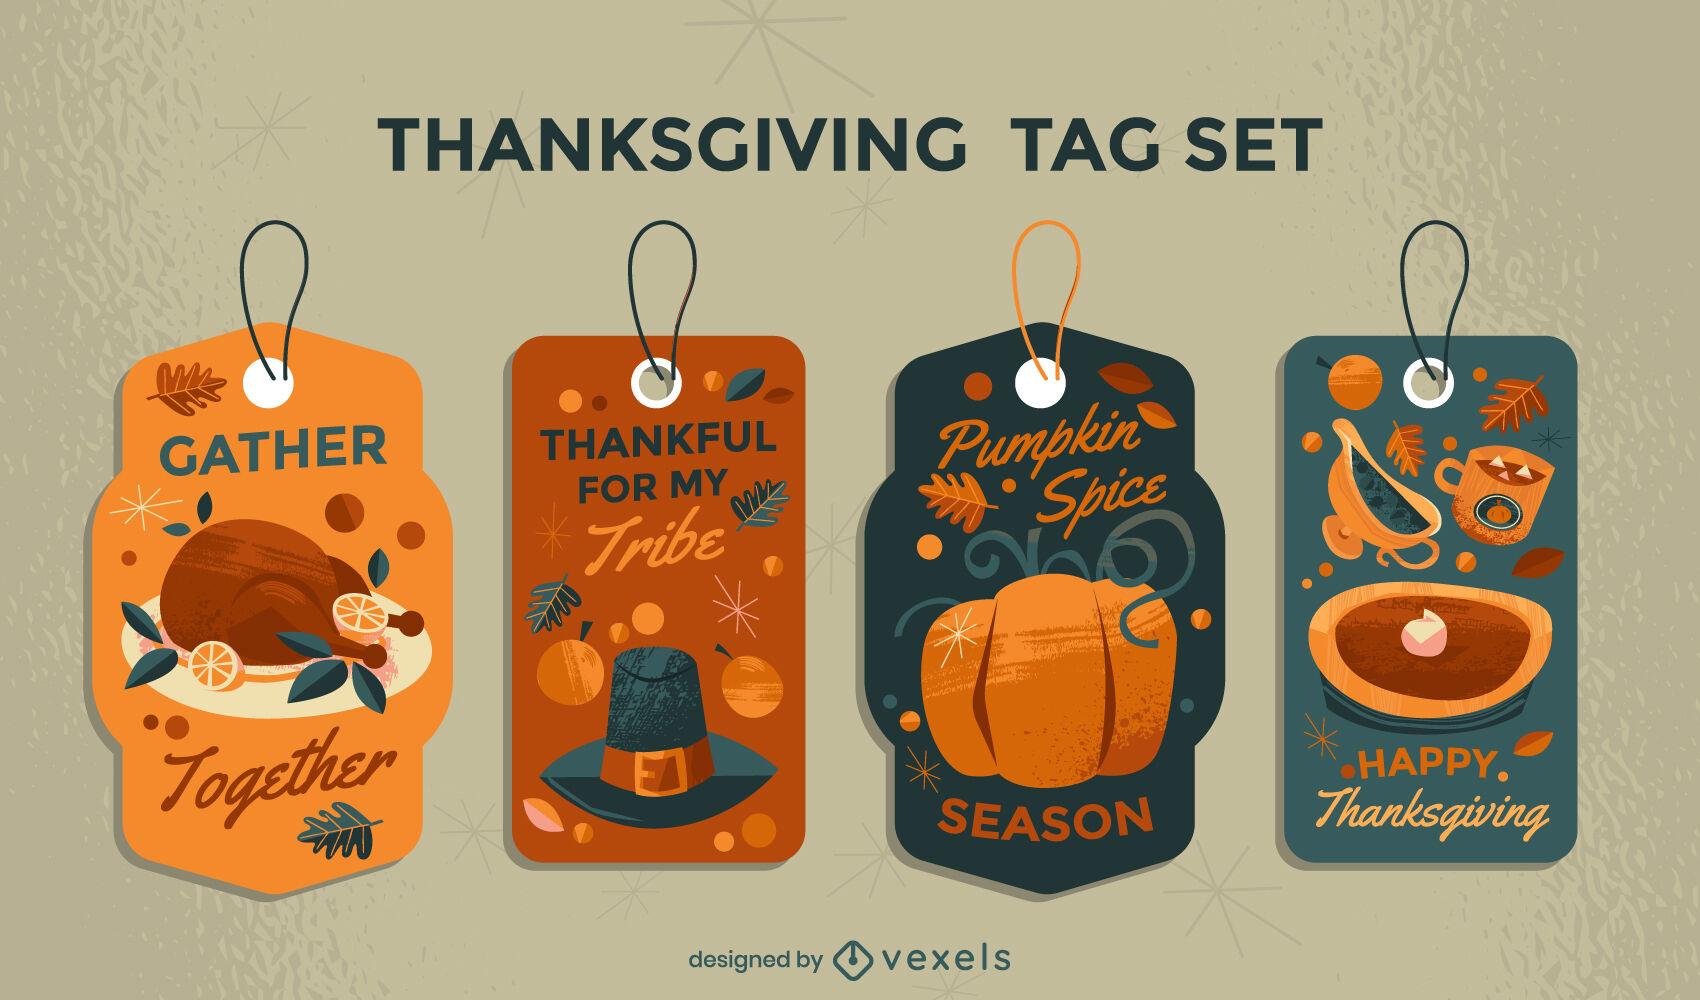 Conjunto de etiquetas de comida navideña tradicional de acción de gracias